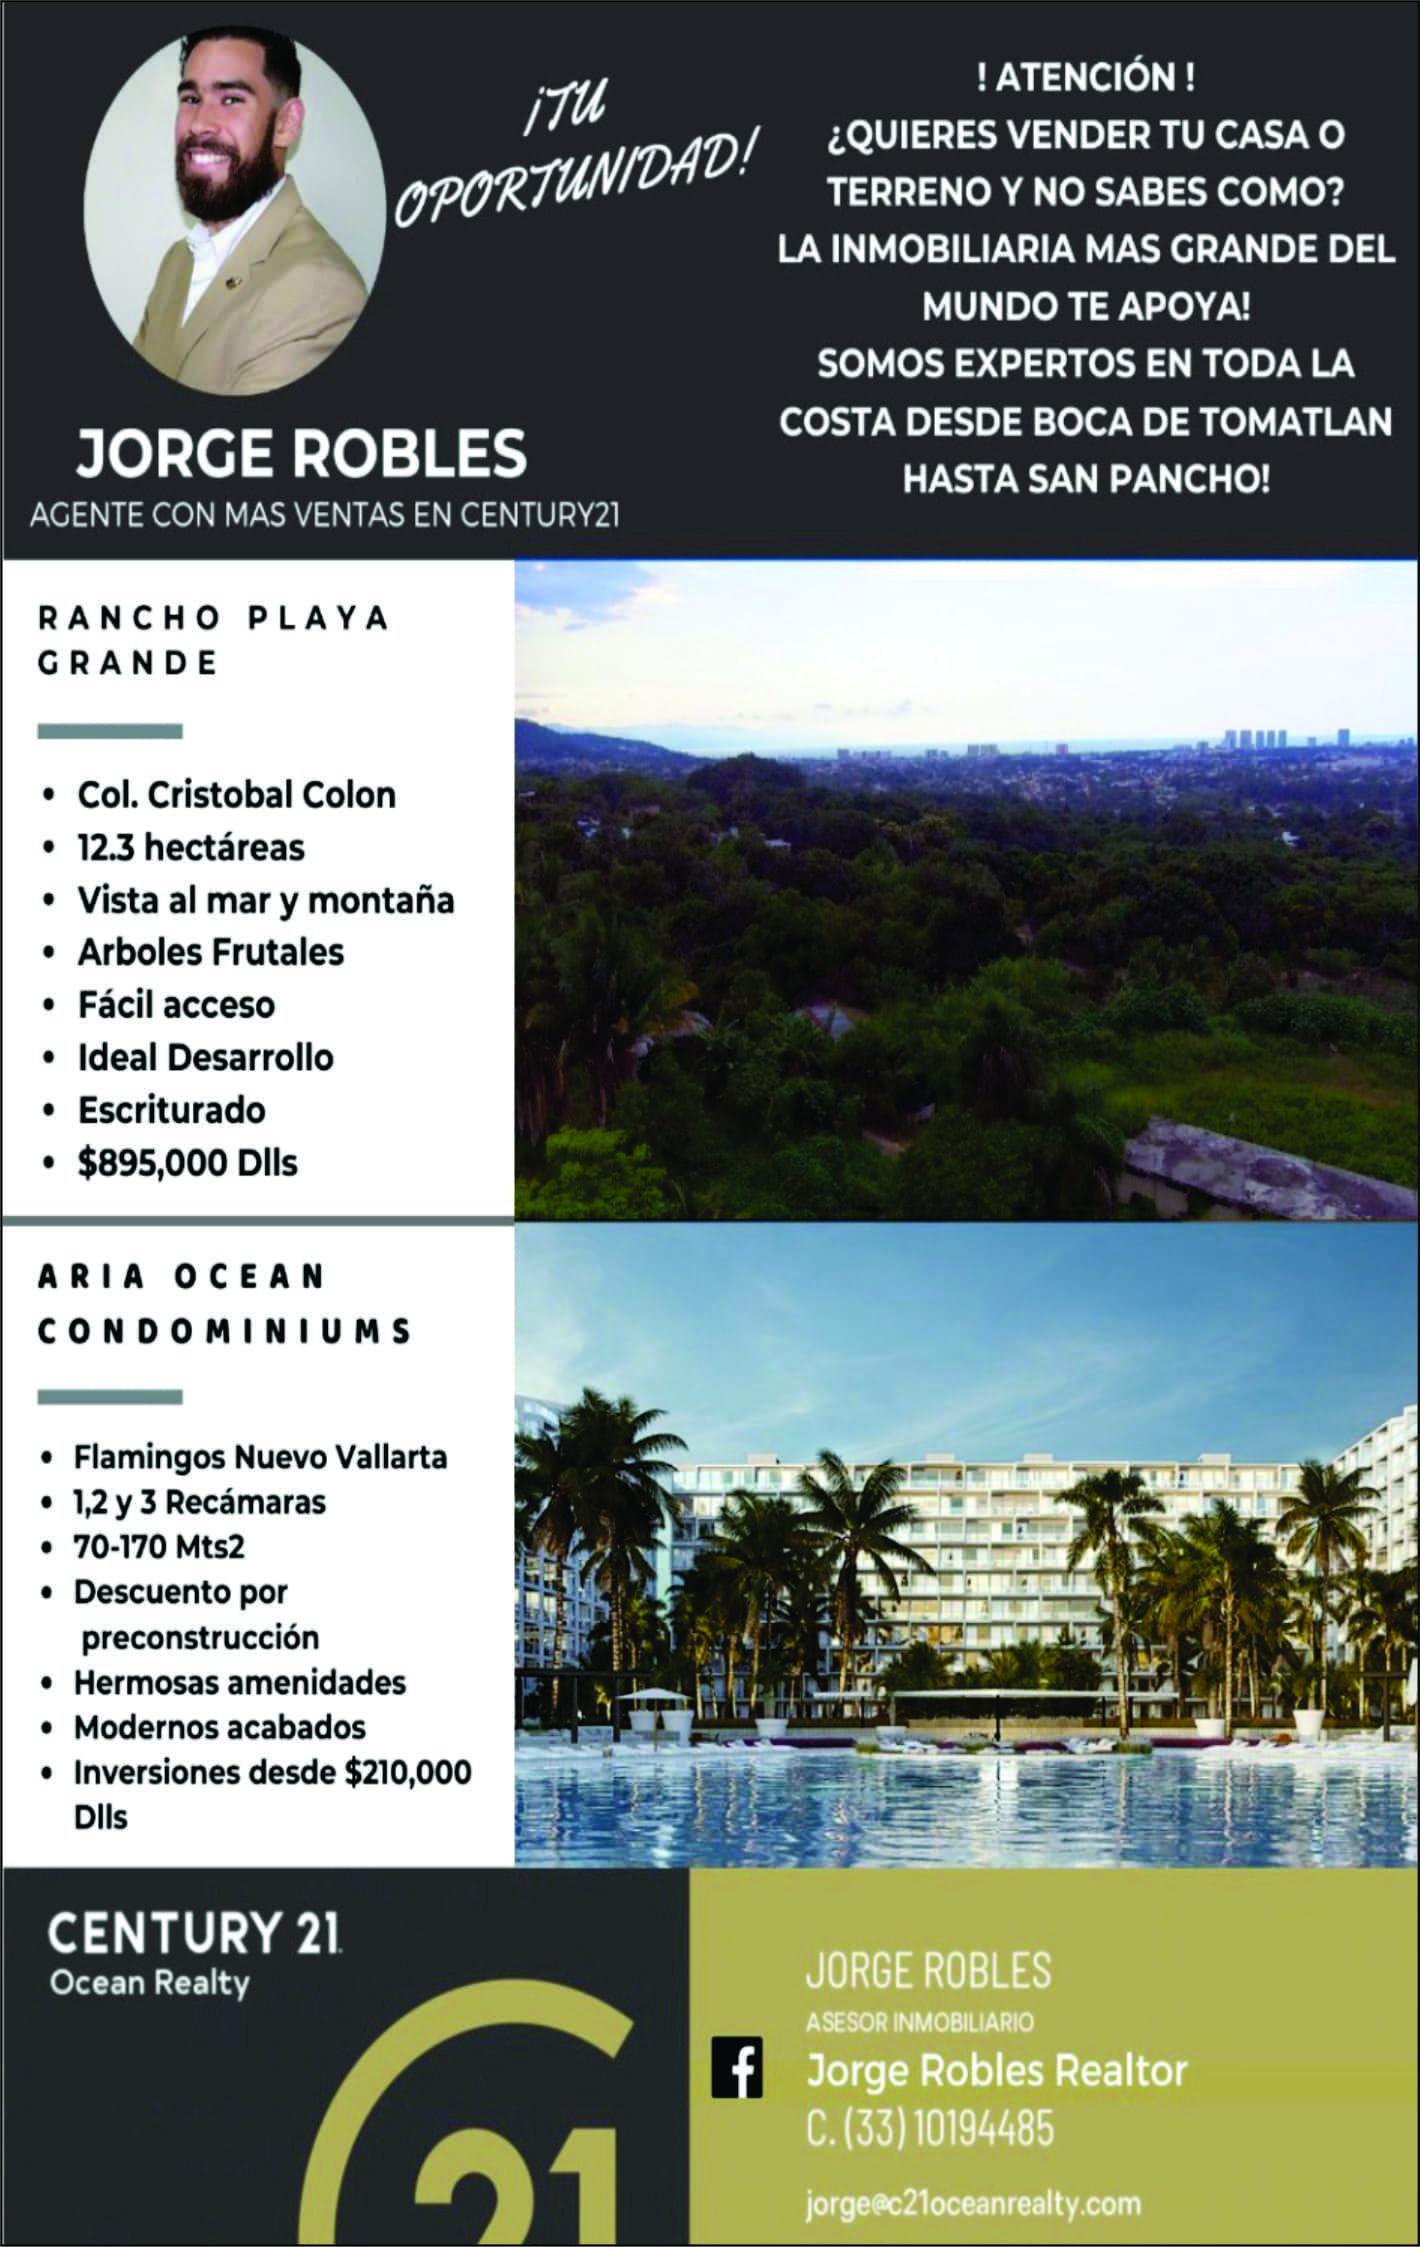 Jorge robles disen%cc%83o